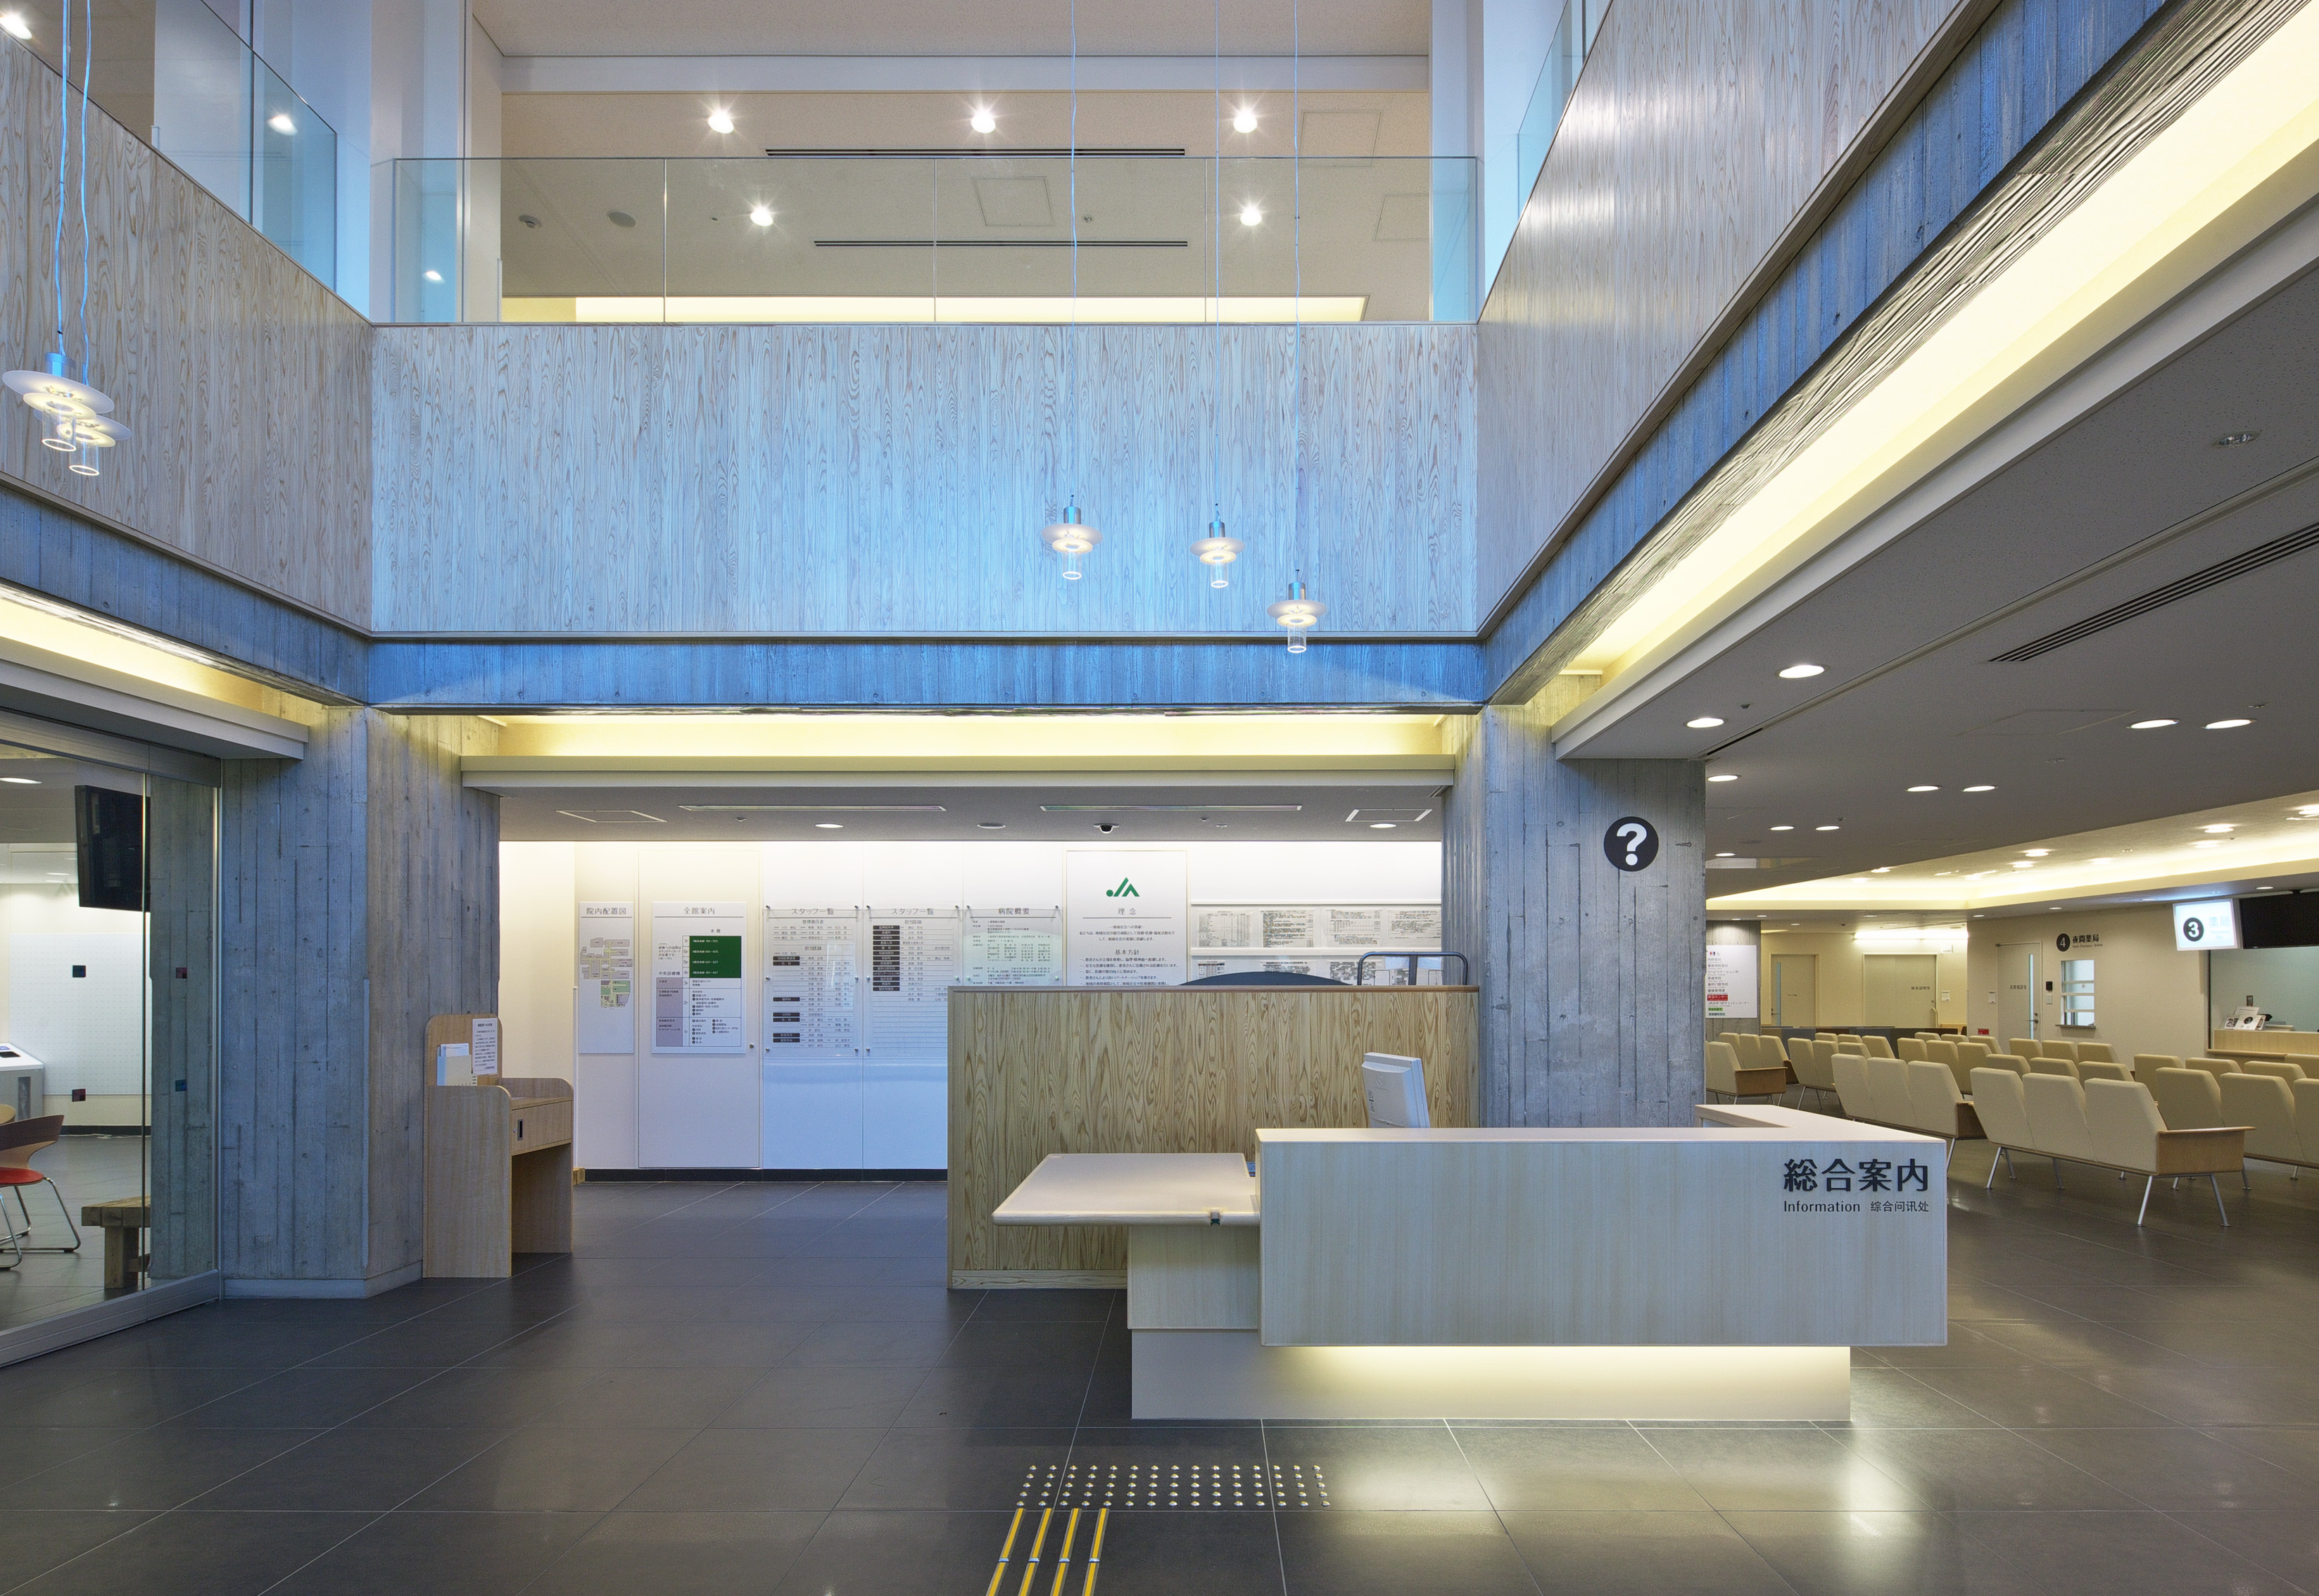 【正看護師/鹿沼市】 病院 上都賀総合病院 (パート)の画像2